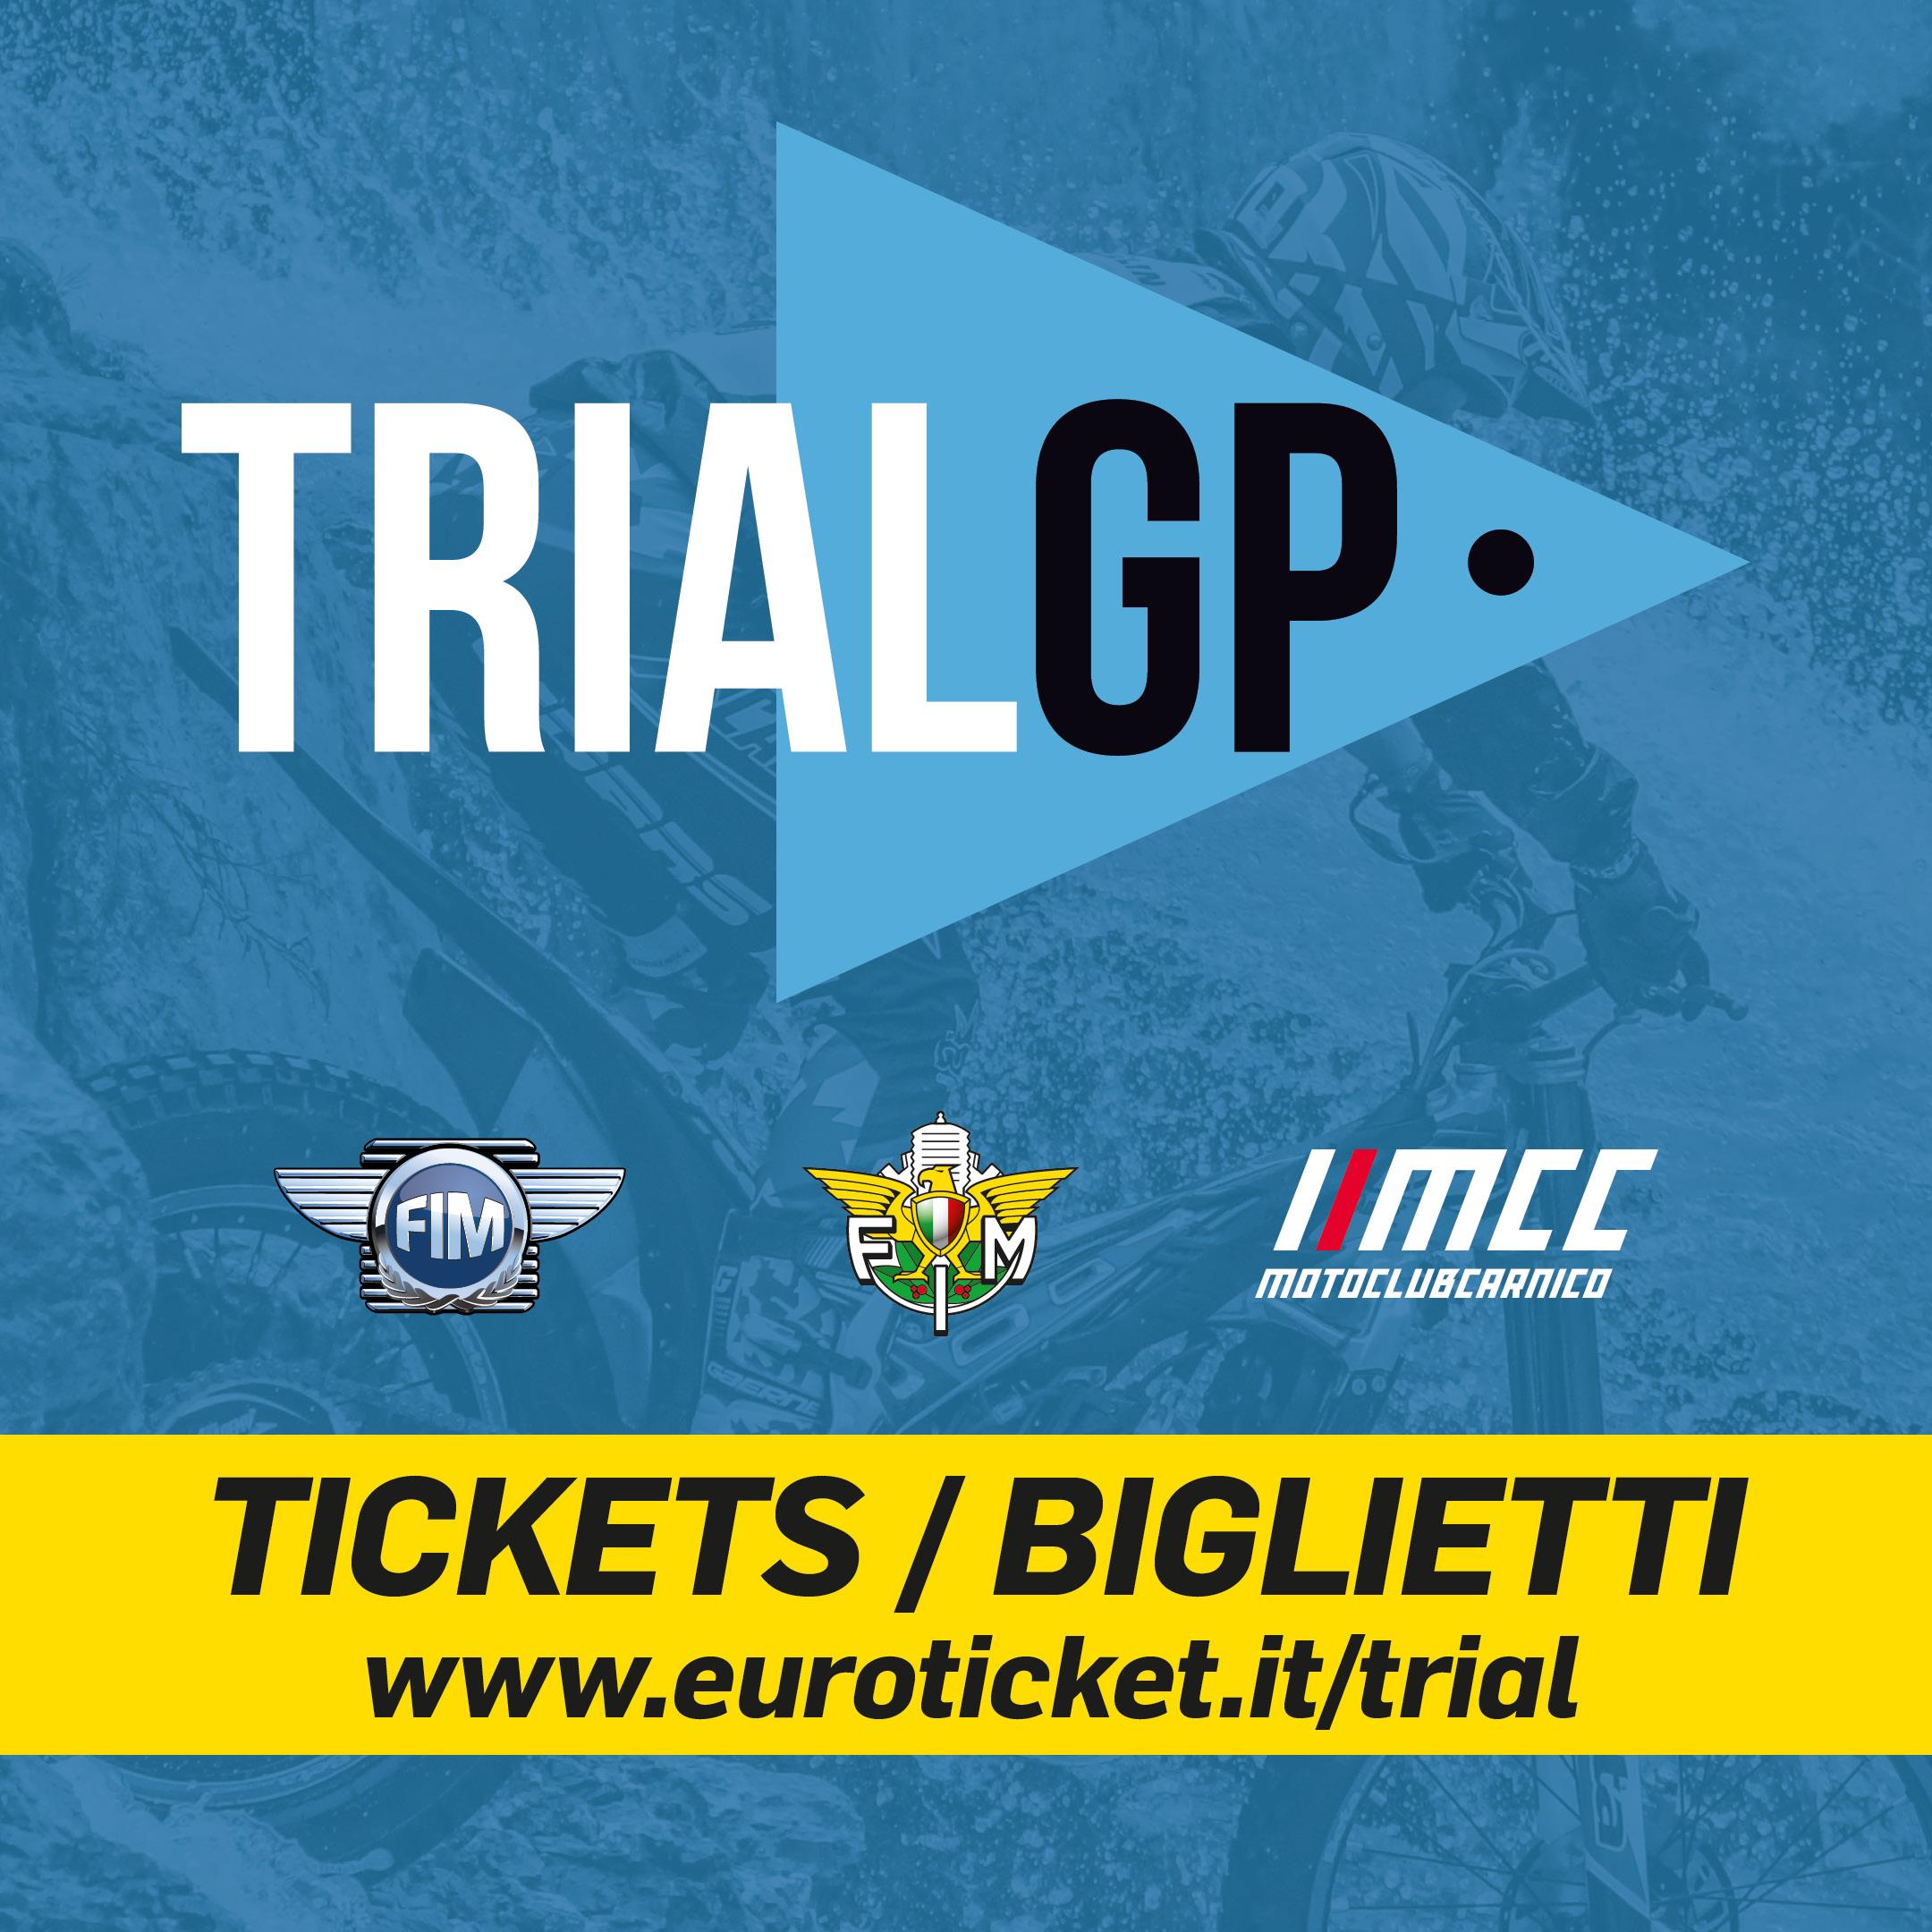 TRIAL GP 2021 – TICKETS